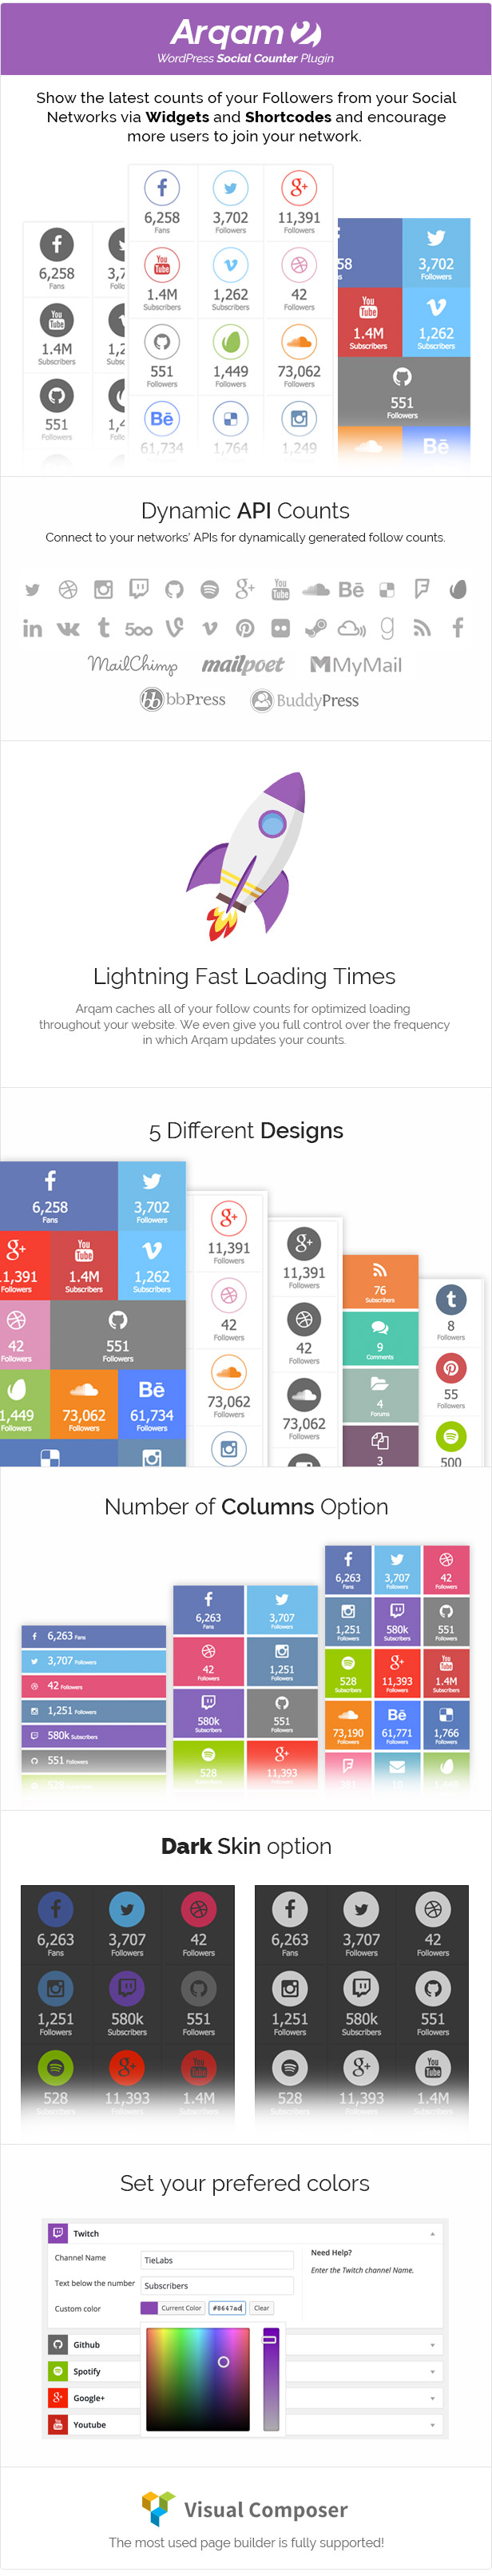 Social Counter Plugin for WordPress - Arqam 1